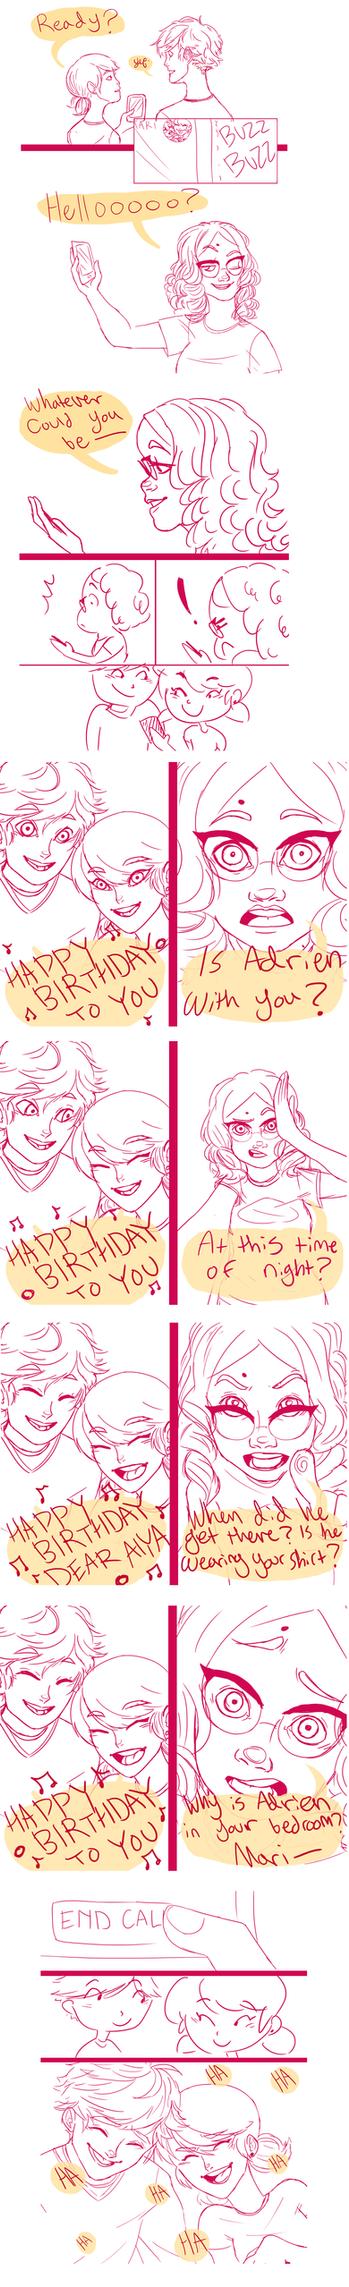 Happy Birthday by Clovercard